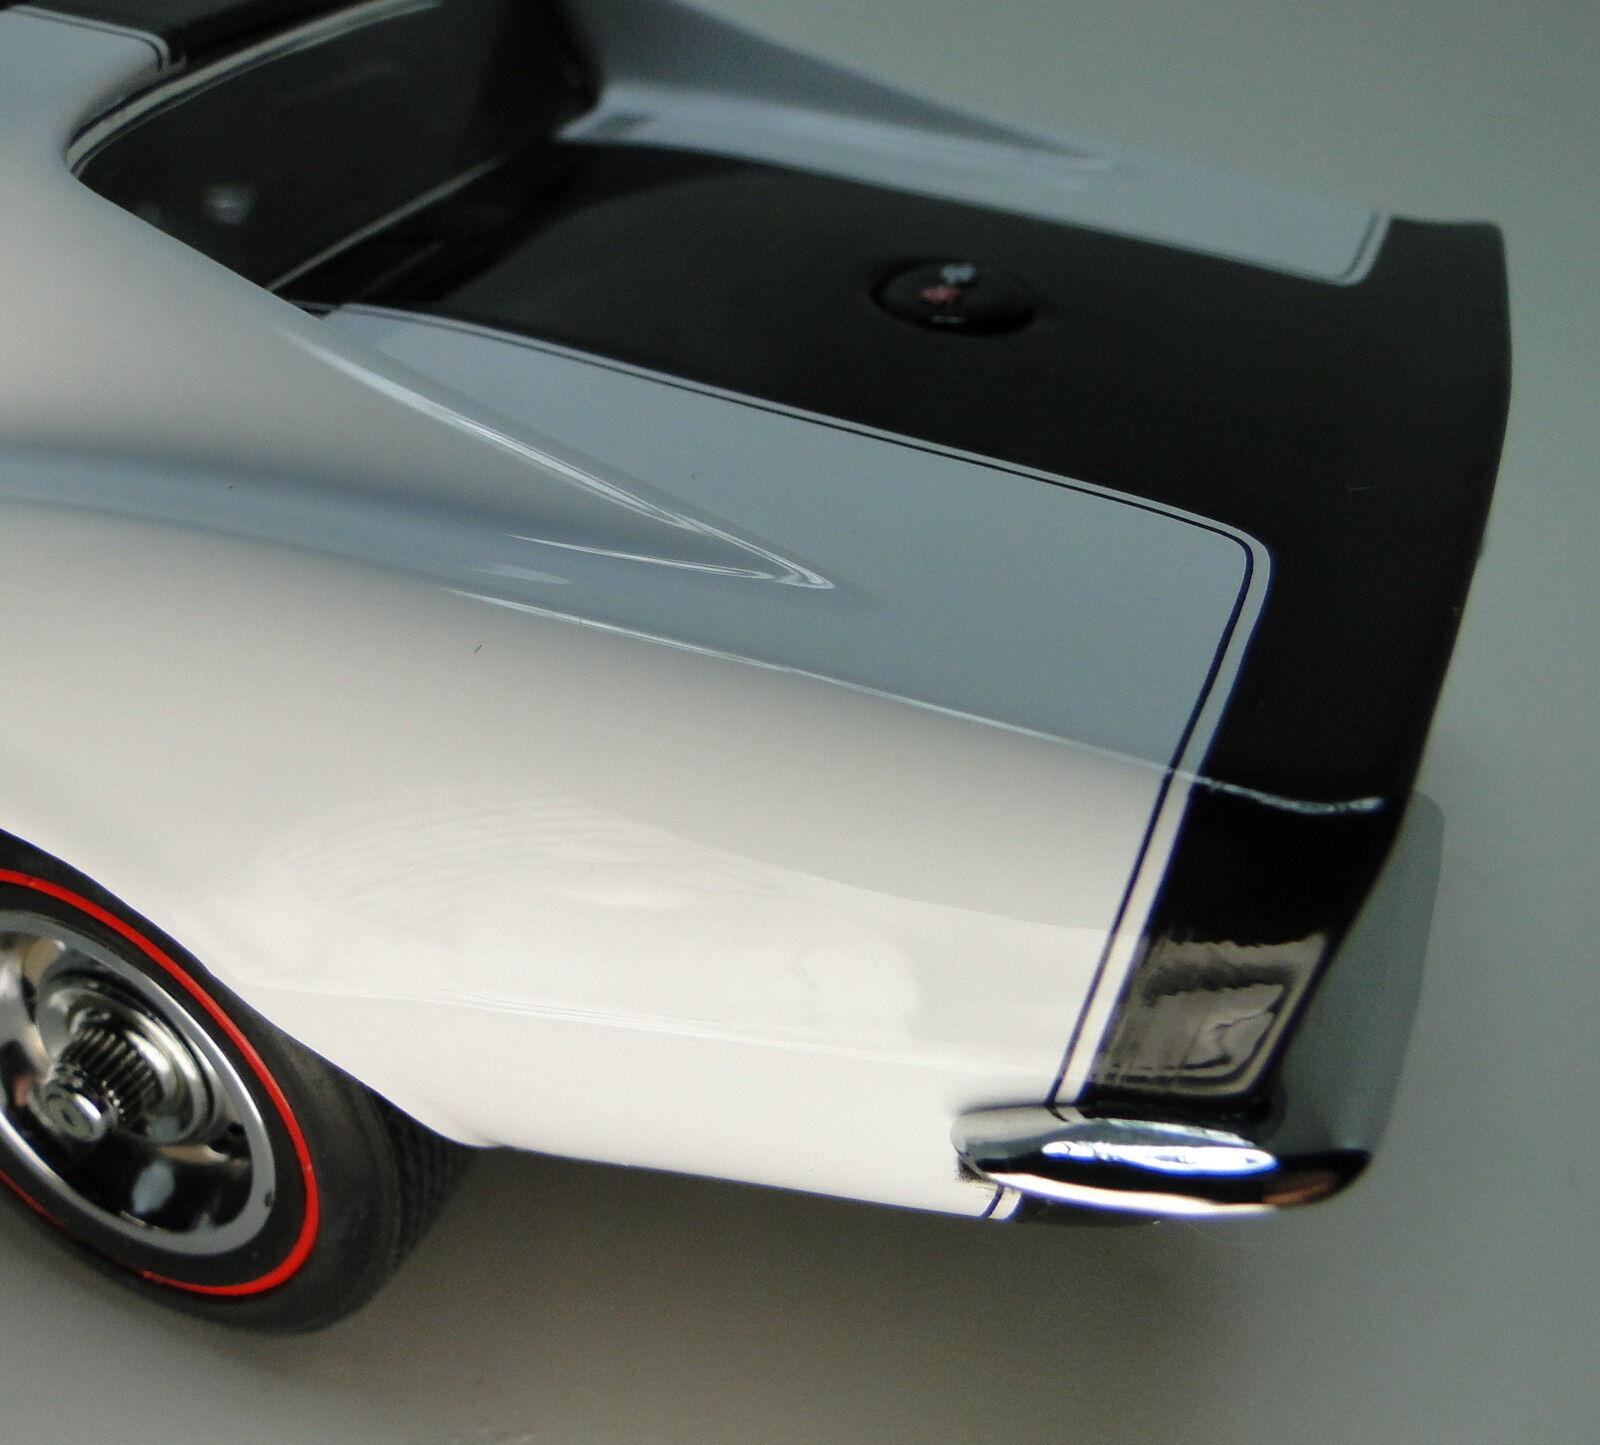 1 Vette ZL1 Corvette Chevy Chevy Chevy 1969 Race Sport Car 24 Vintage 12 Carousel White 18 add582